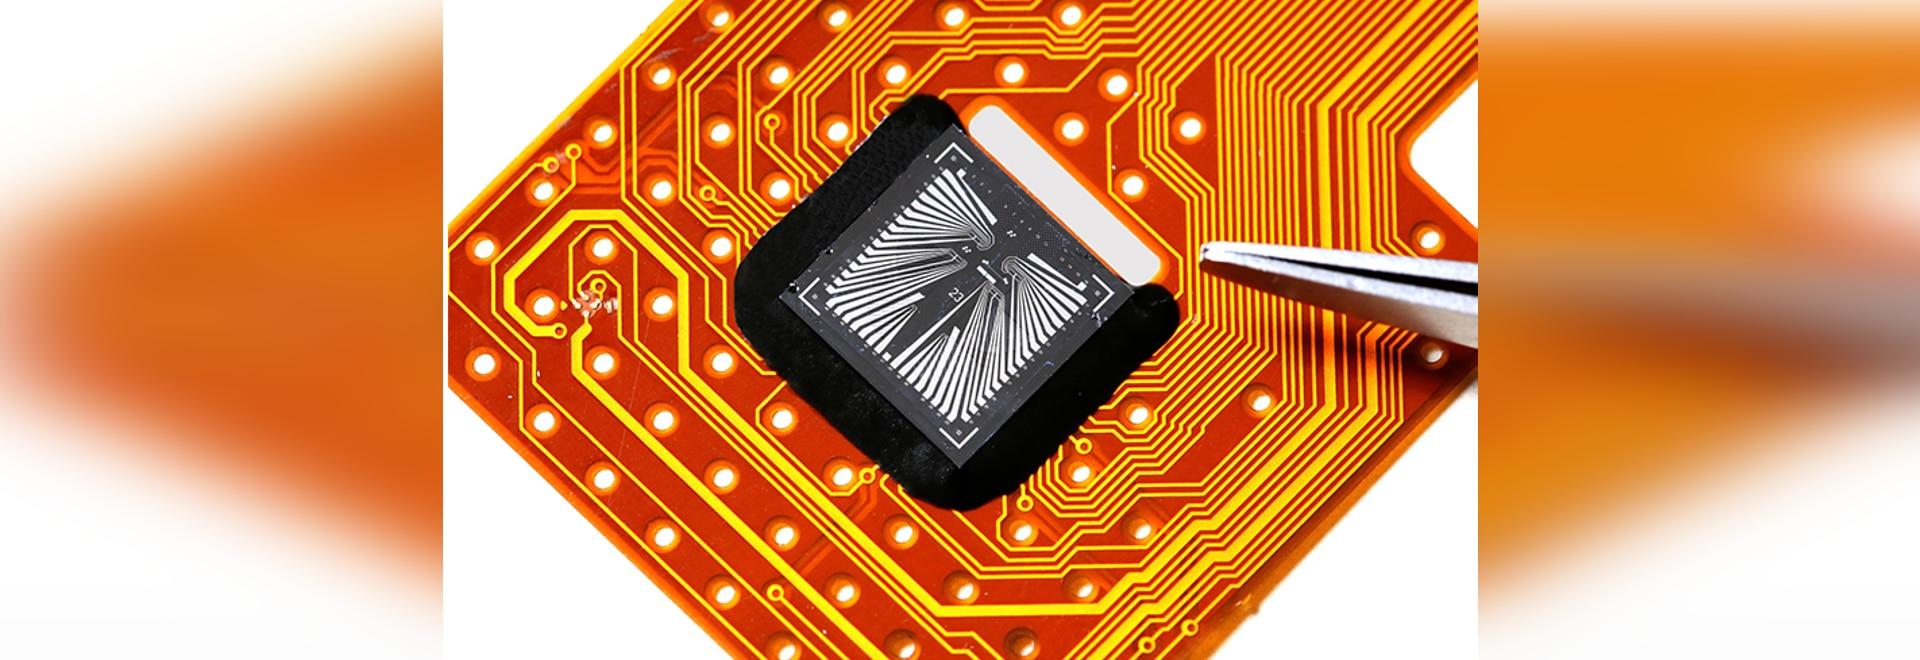 Sensor Pulls Sweat from Skin to Measure Multiple Biomarkers